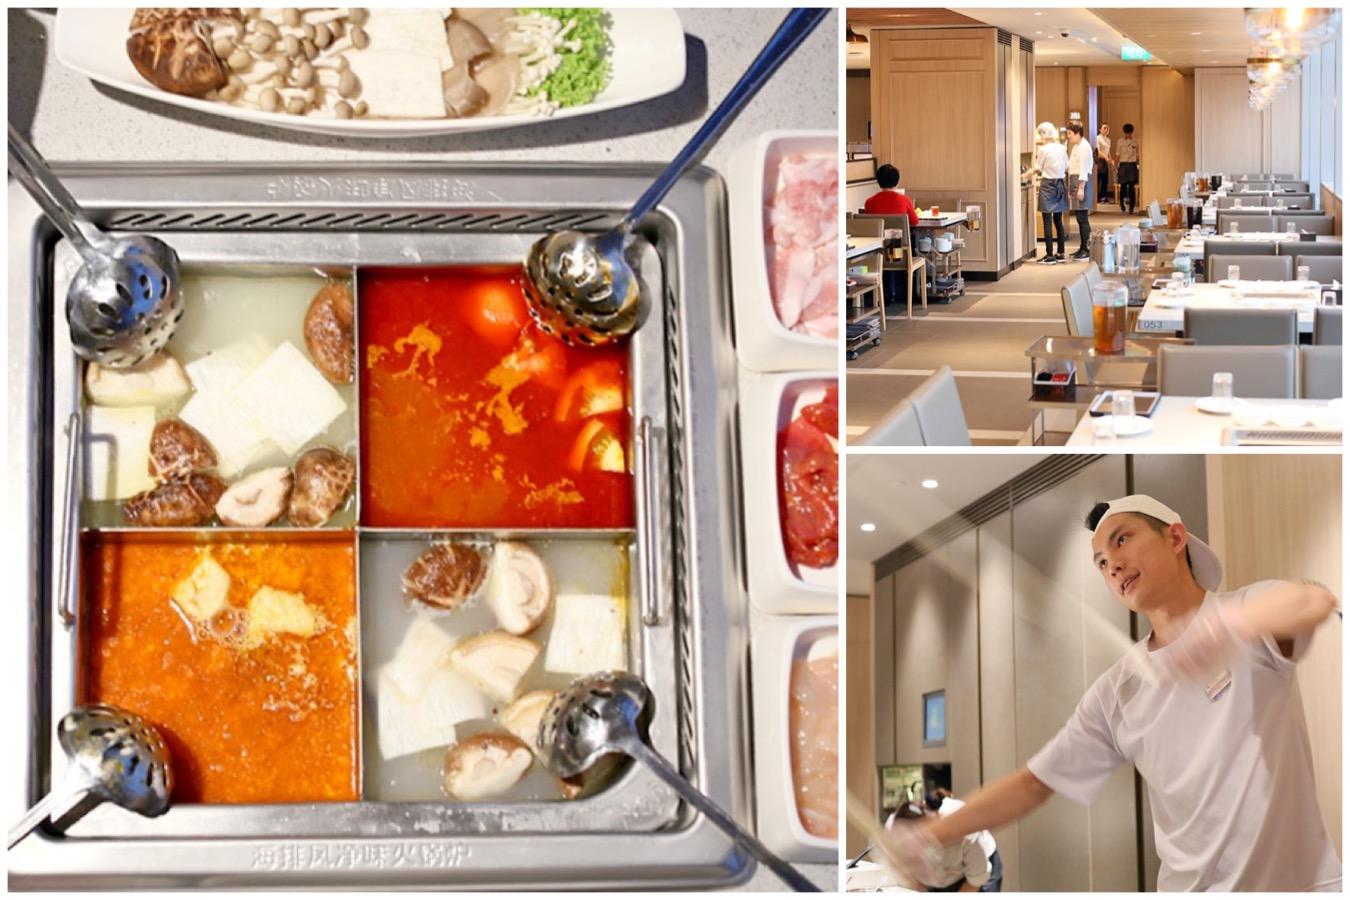 Hai Di Lao 海底捞 - Chinese Hotpot Restaurant At Plaza Singapura, Daily Till 6AM